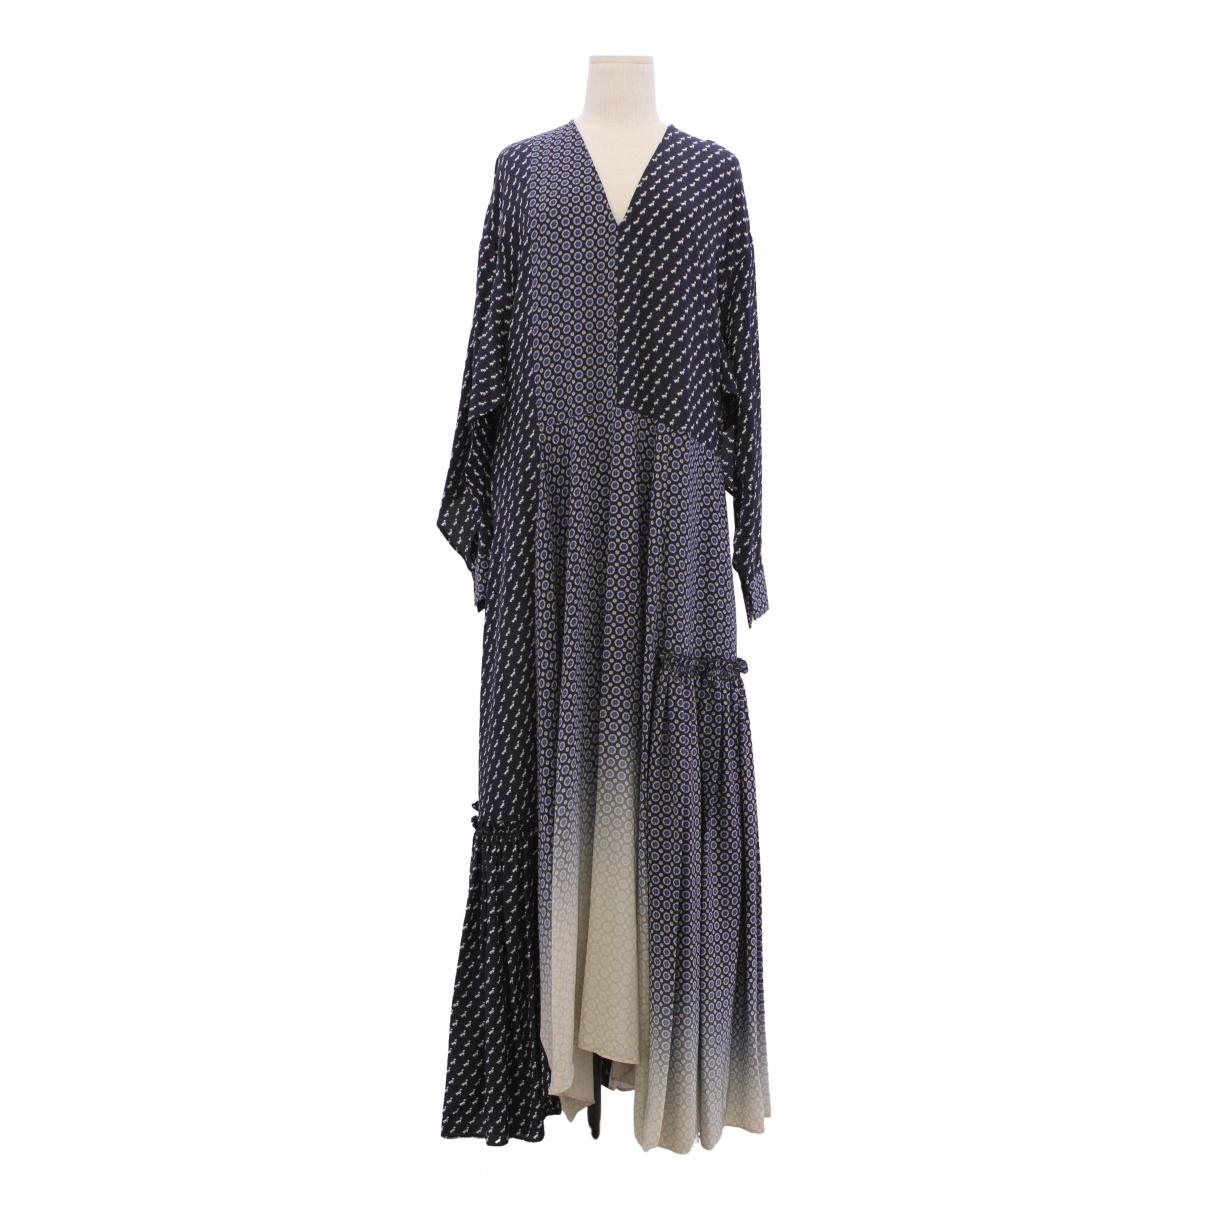 Stella Mccartney \N Navy Silk dress for Women 38 FR